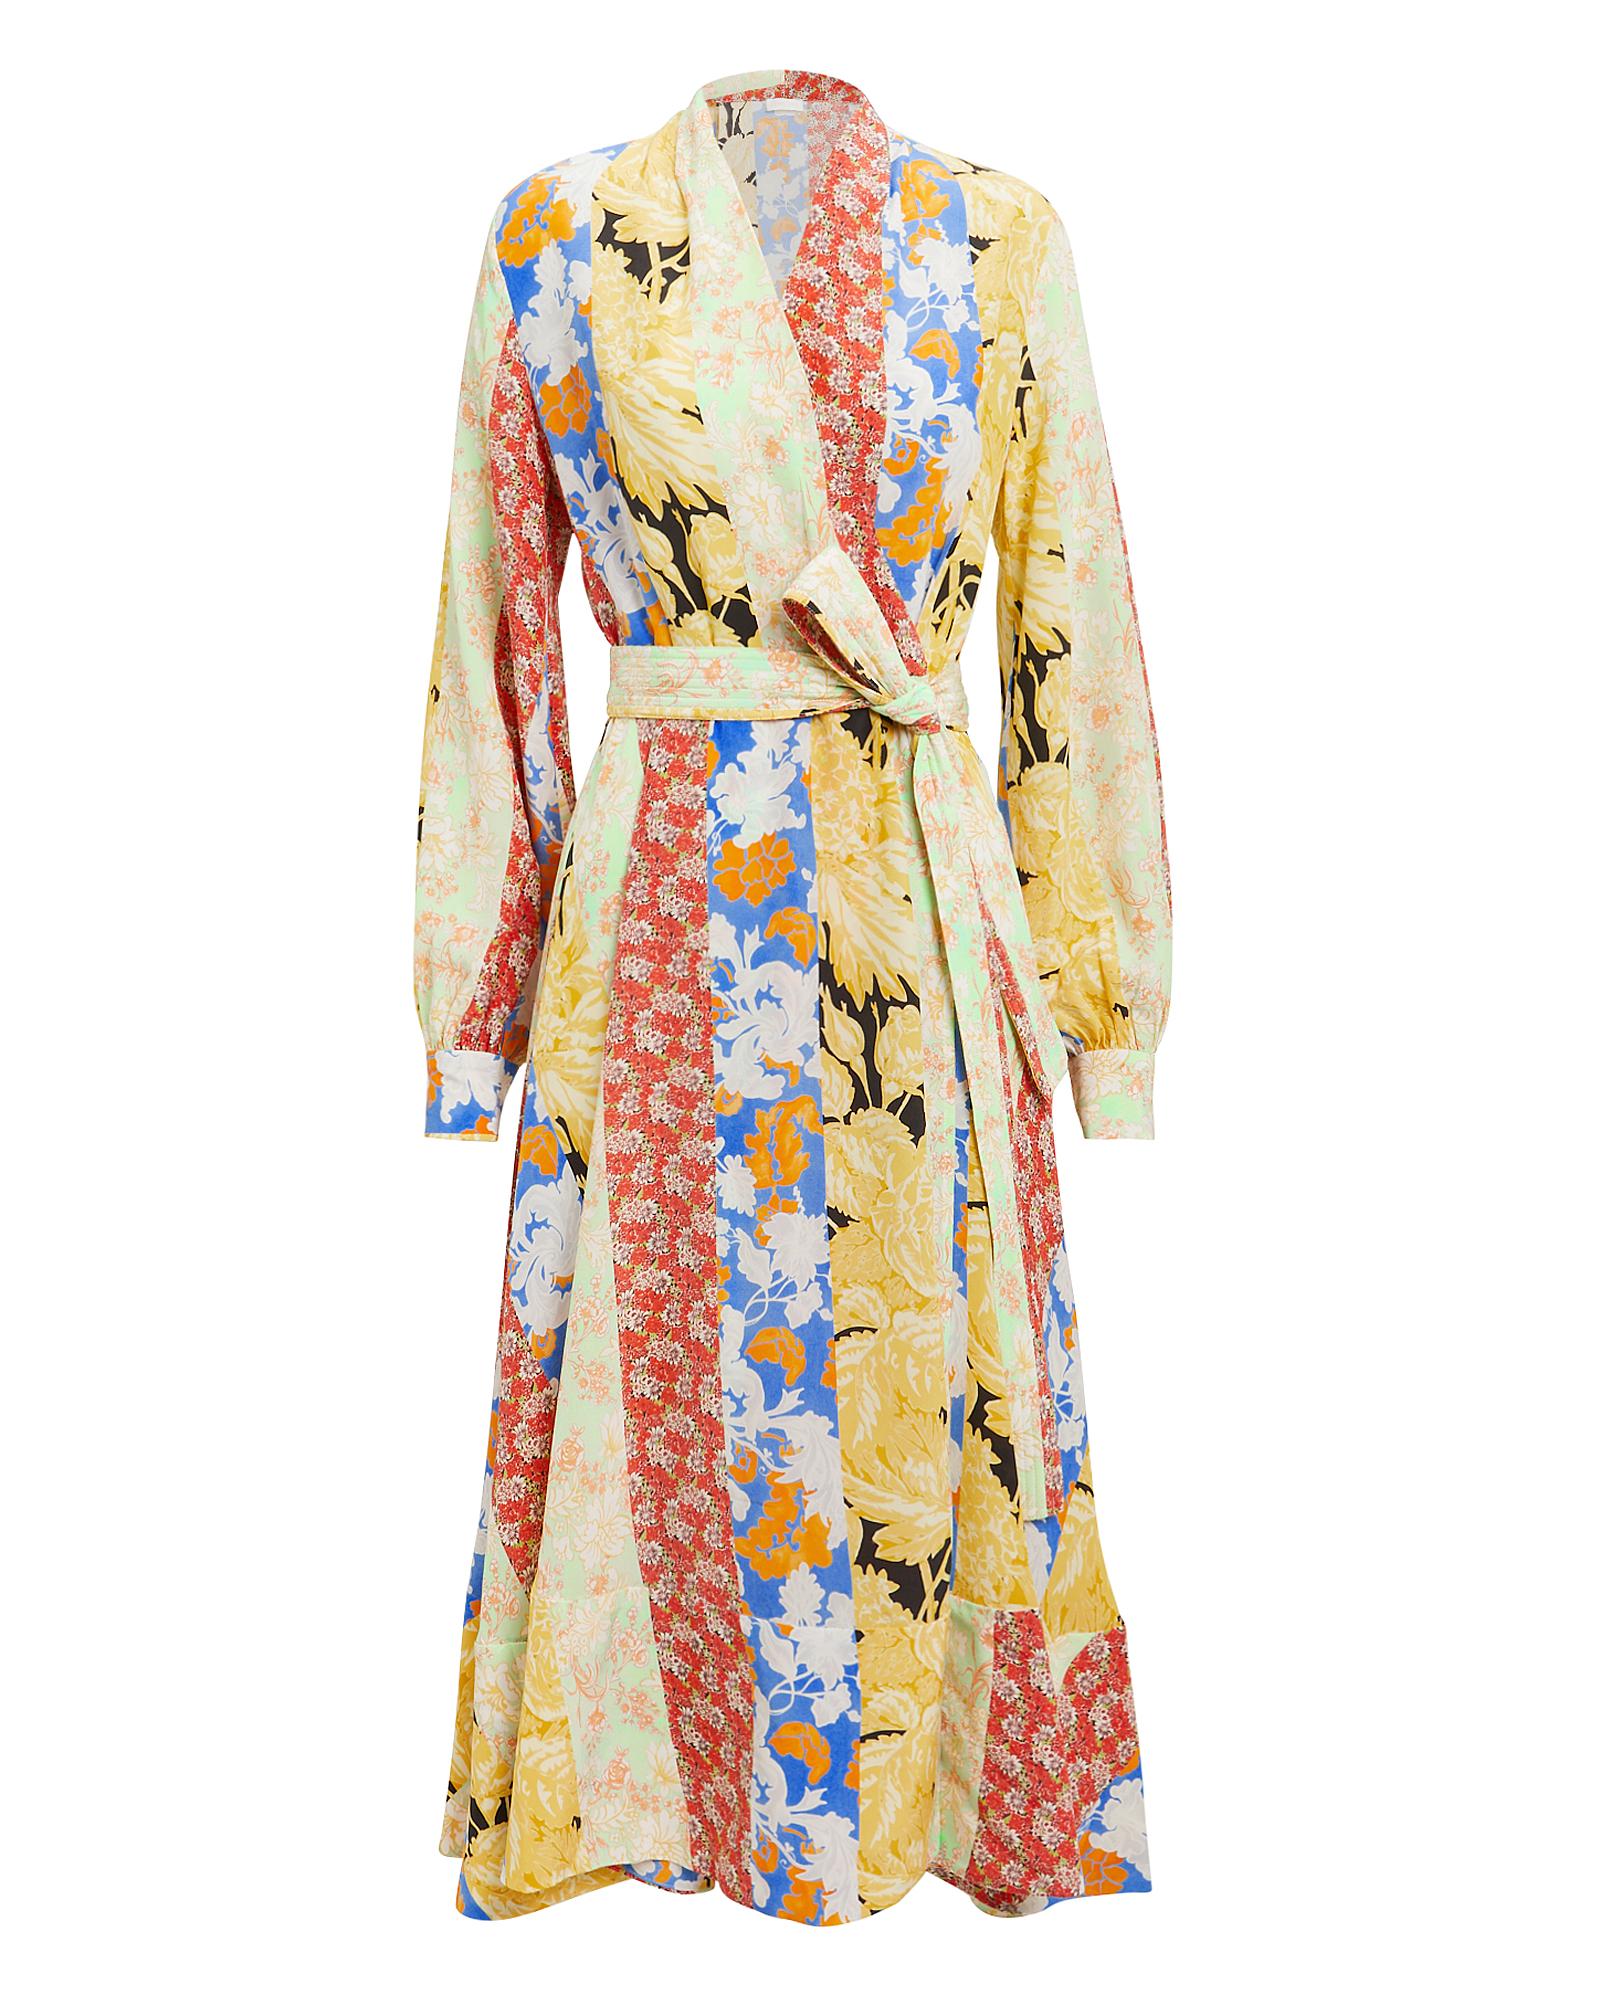 Stine Goya Dresses STINE GOYA REFLECTION WALLPAPER DRESS  YELLOW/FLORAL S